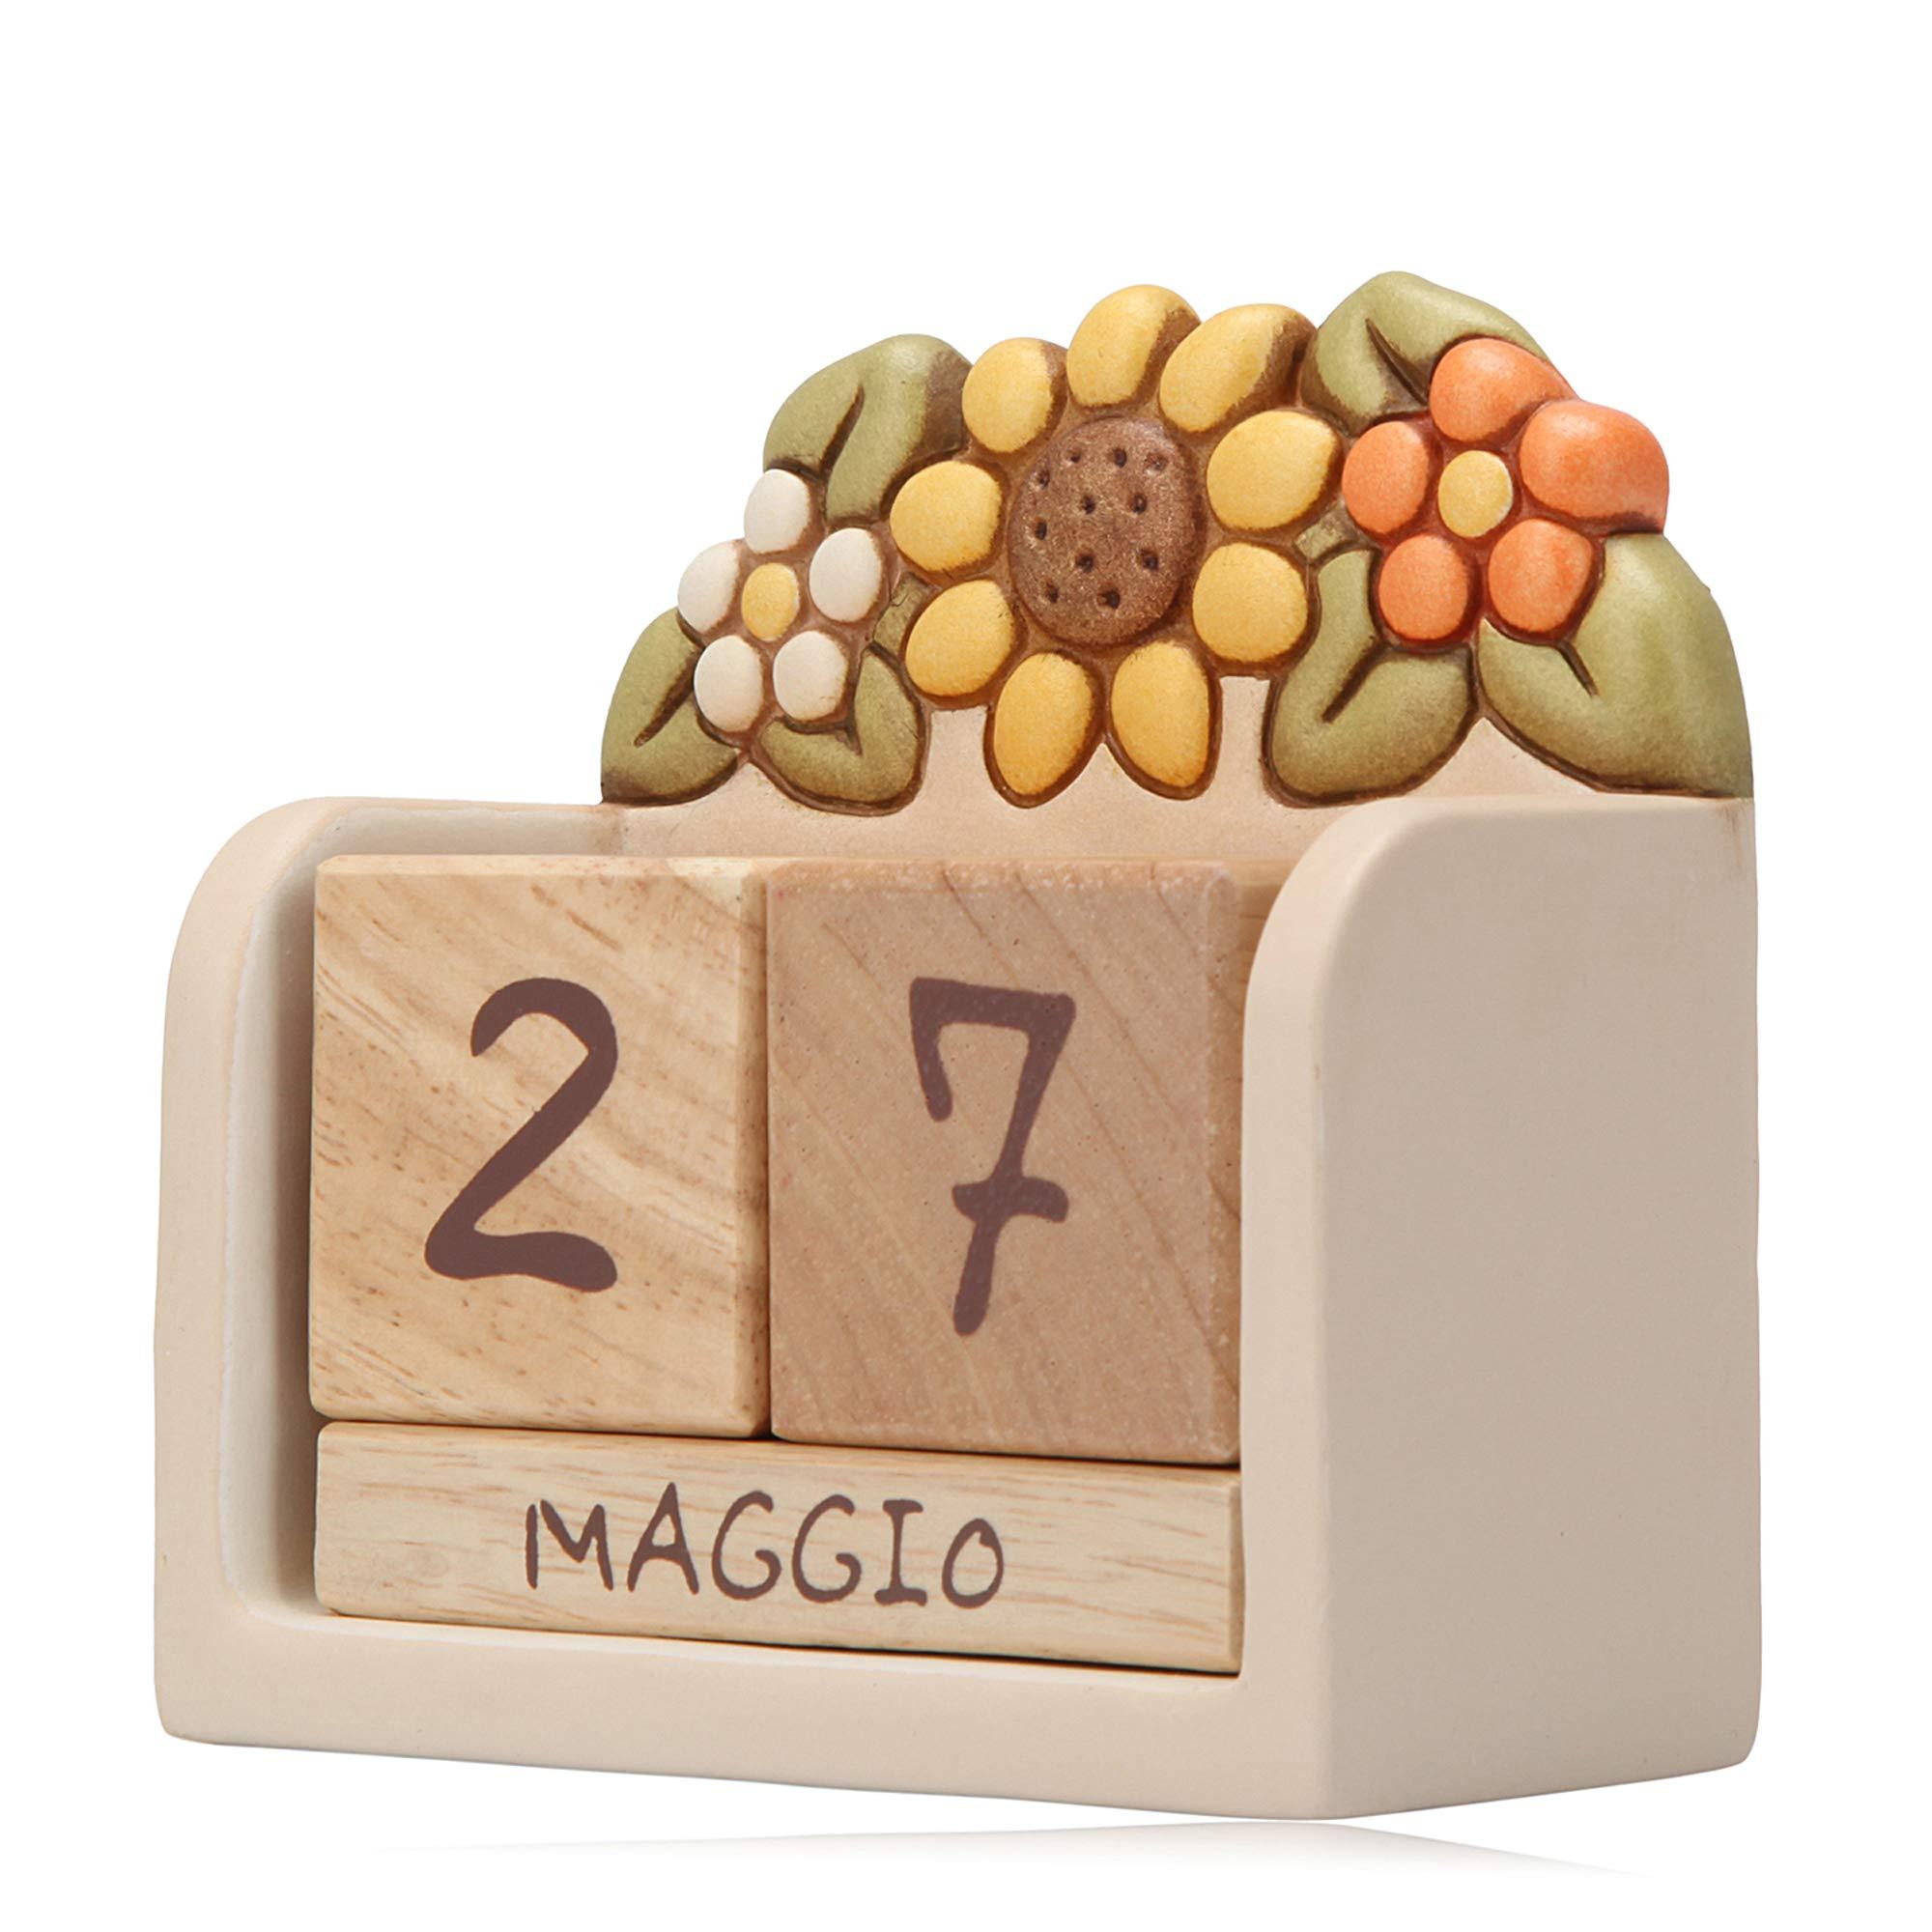 Thun Calendario.Thun Soprammobile Calendario Perpetuo Da Tavolo Ceramica Con Cubi In Legno Linea Country